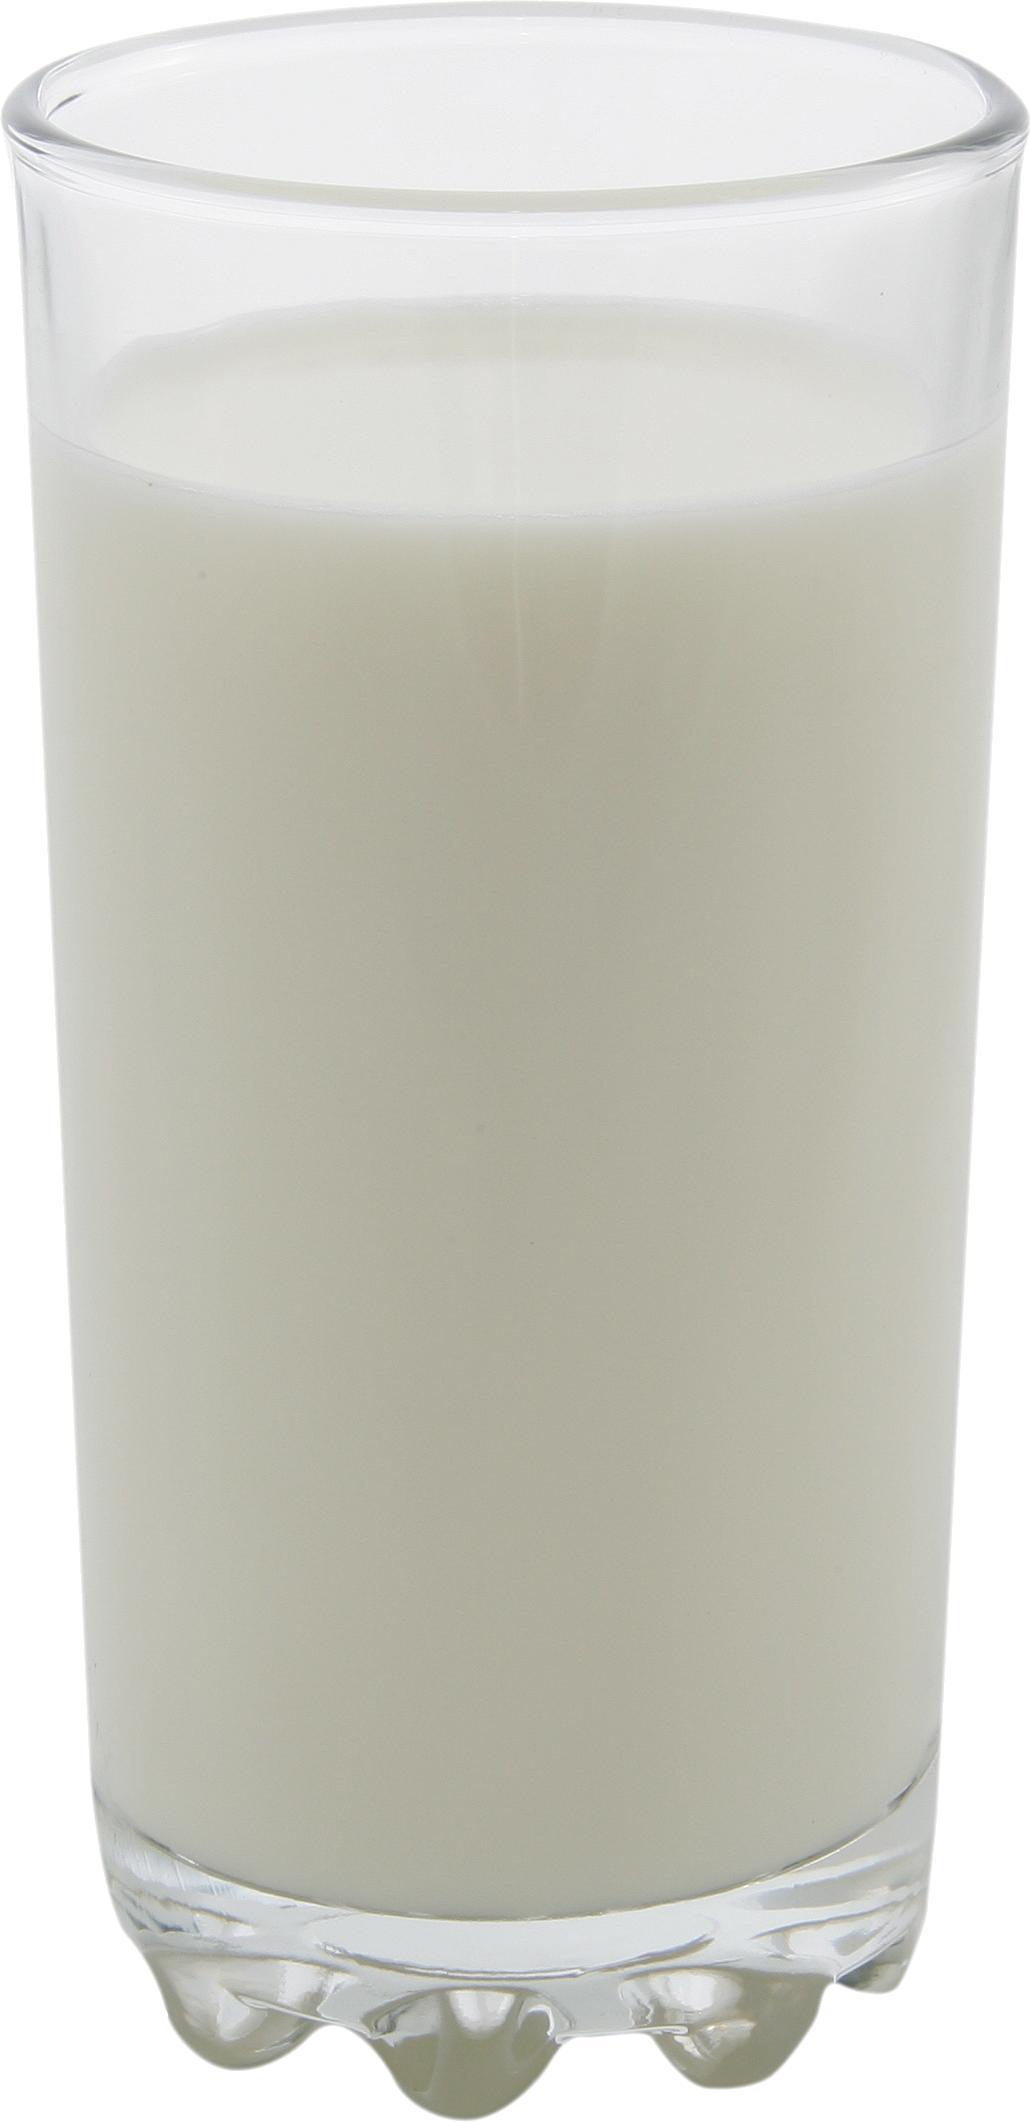 Milk Png Image Milk Png Images Image